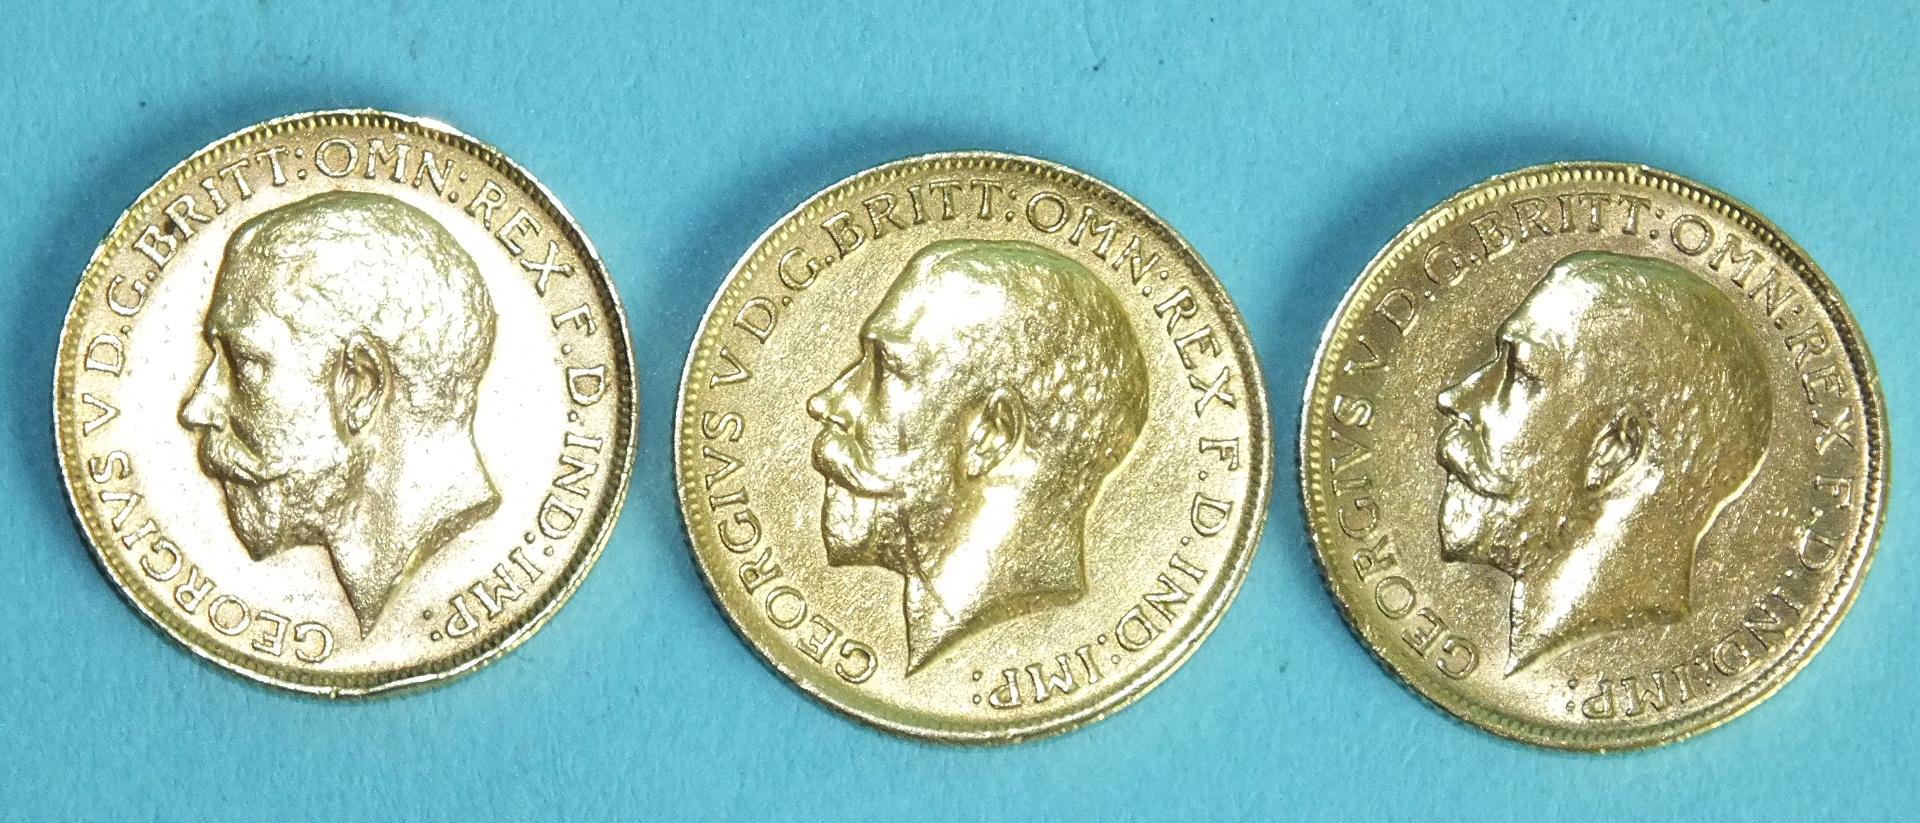 Lot 373 - Three George V 1911 sovereigns, (3).